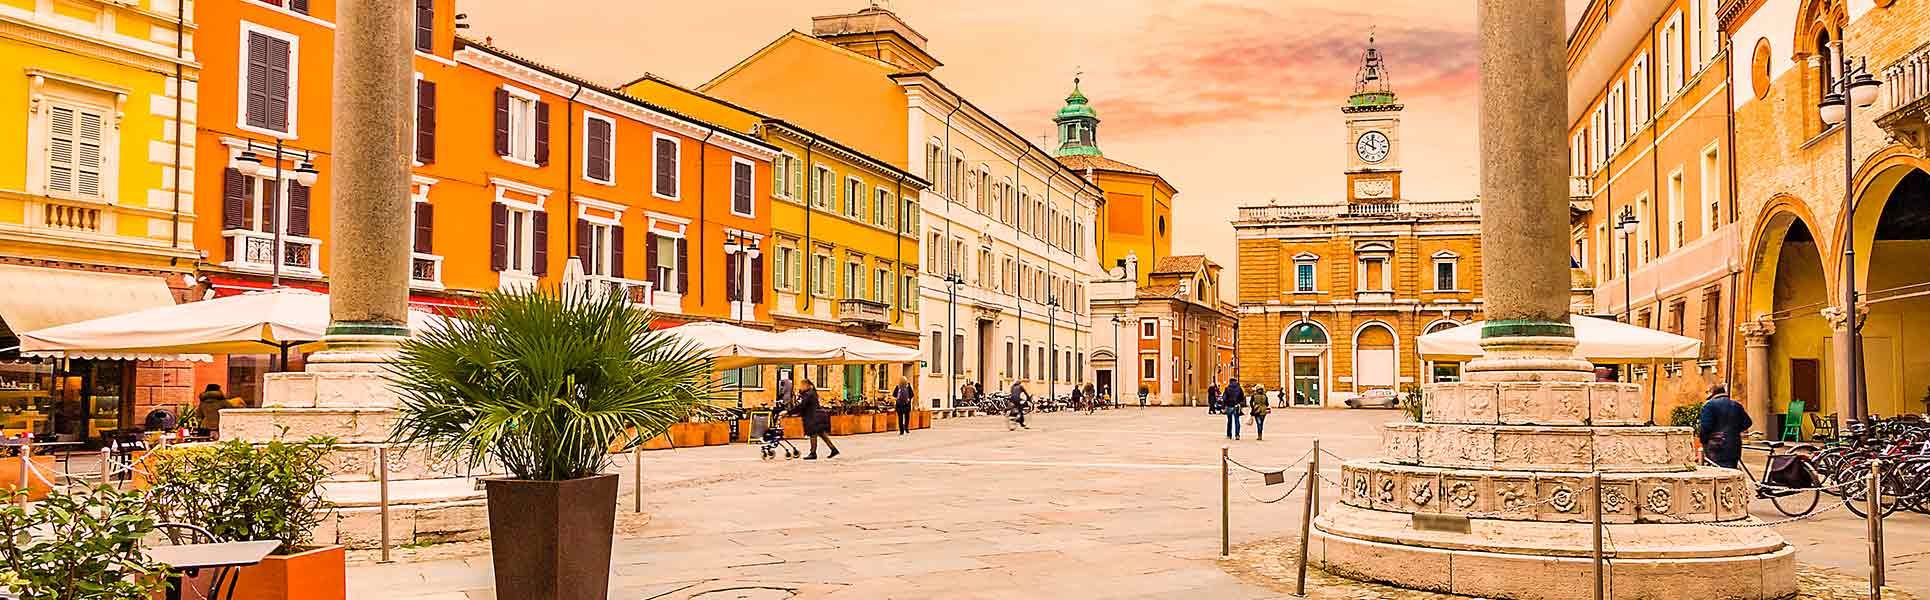 Consolidamento Fondazioni a Ravenna